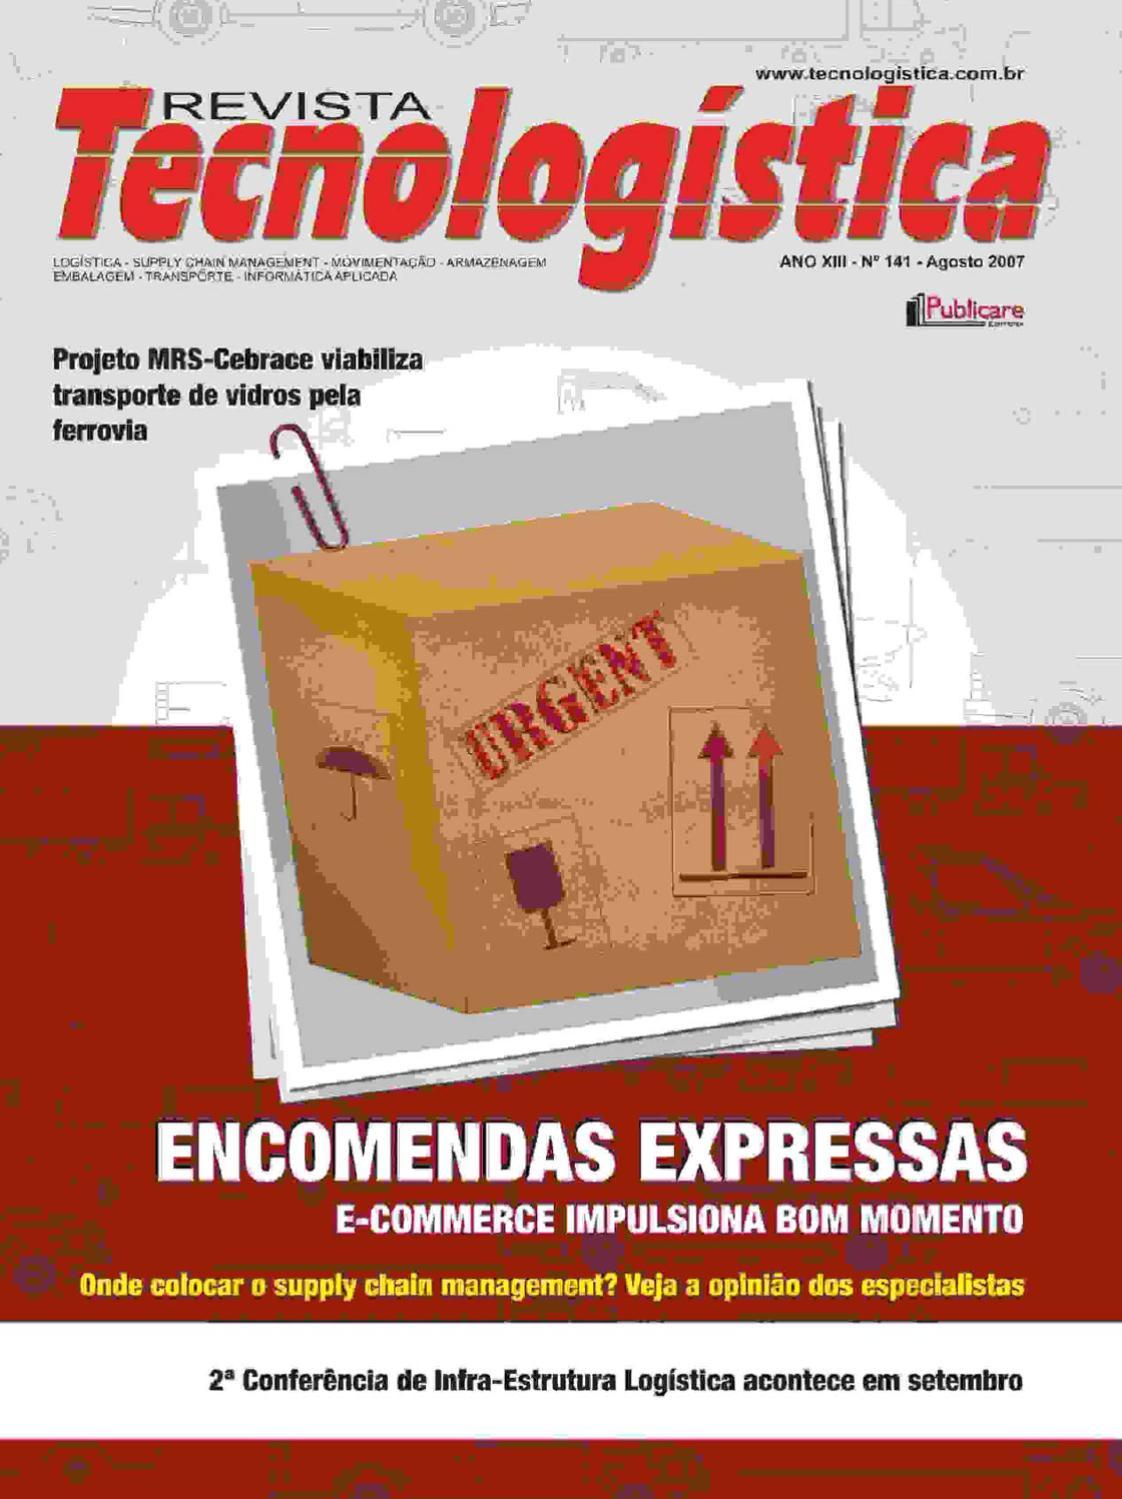 fcab53805d Revista Tecnologística - Ed. 141 - 2007 by Publicare - issuu